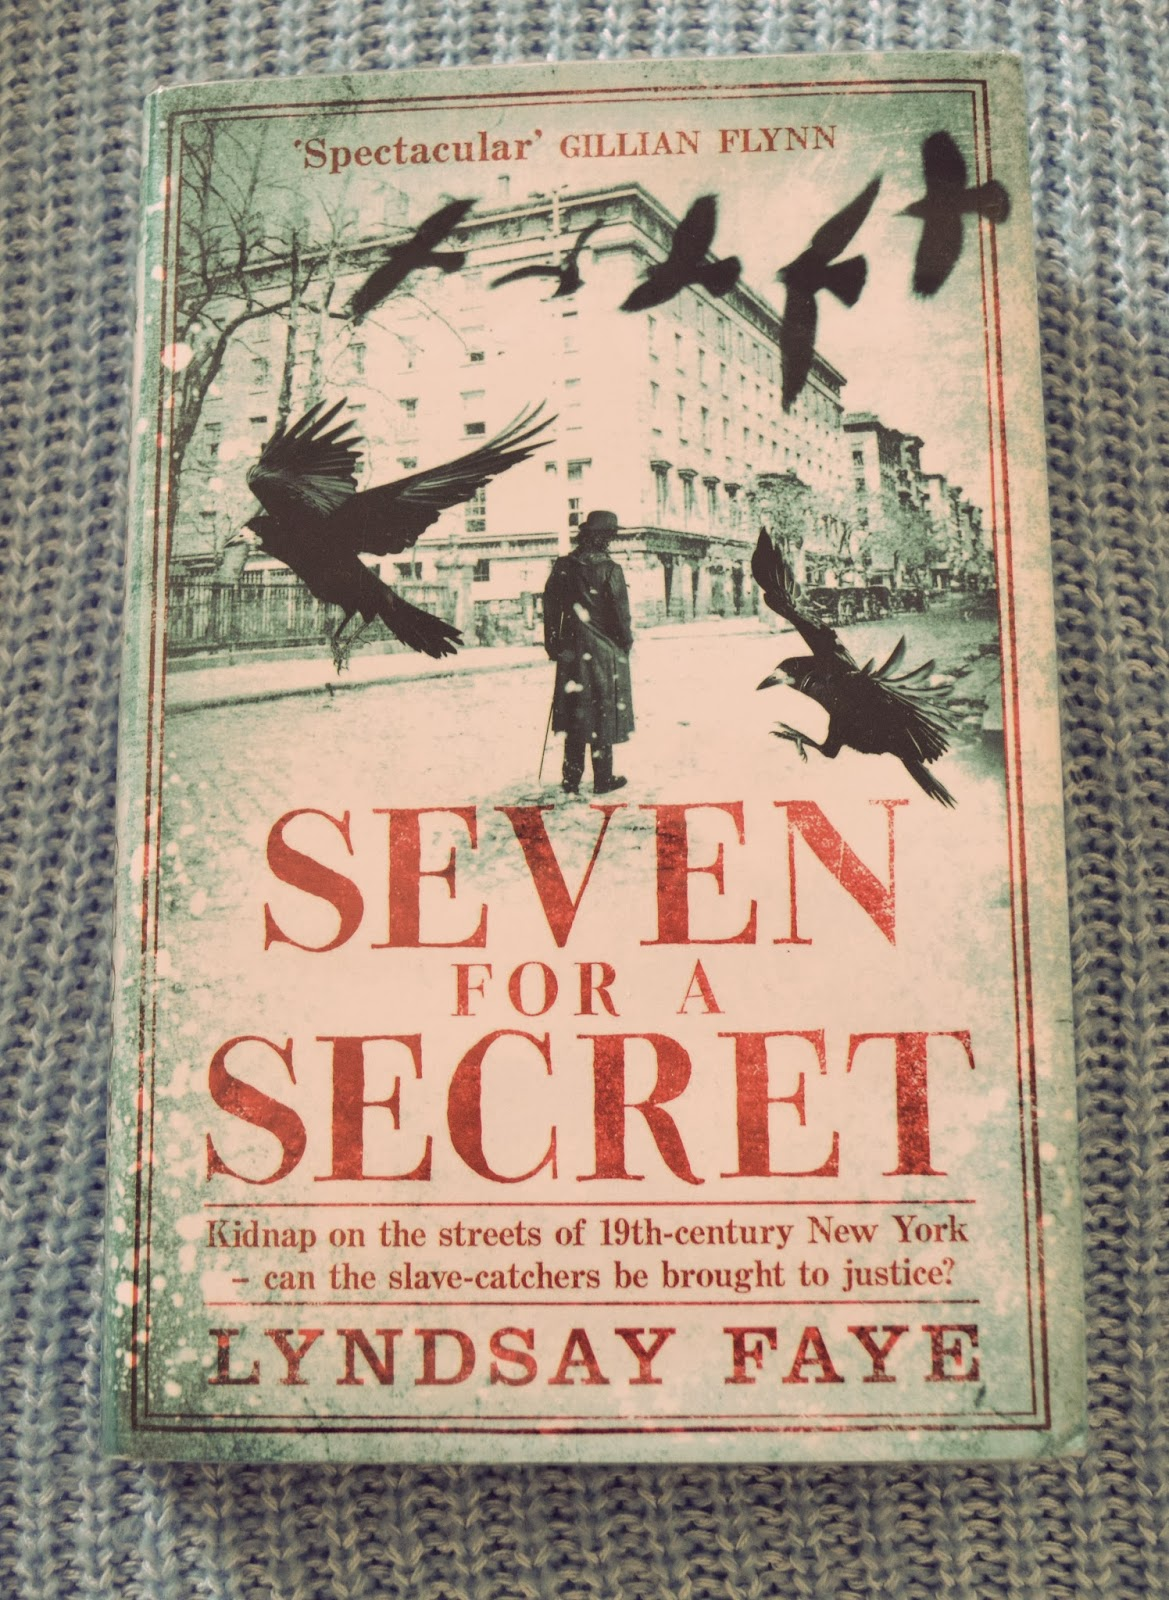 12 years a slave, Lyndsay Faye, American Literature, criminal, slave-catchers, book review, hardback, slave narrative, tragic, historical detective fiction, read